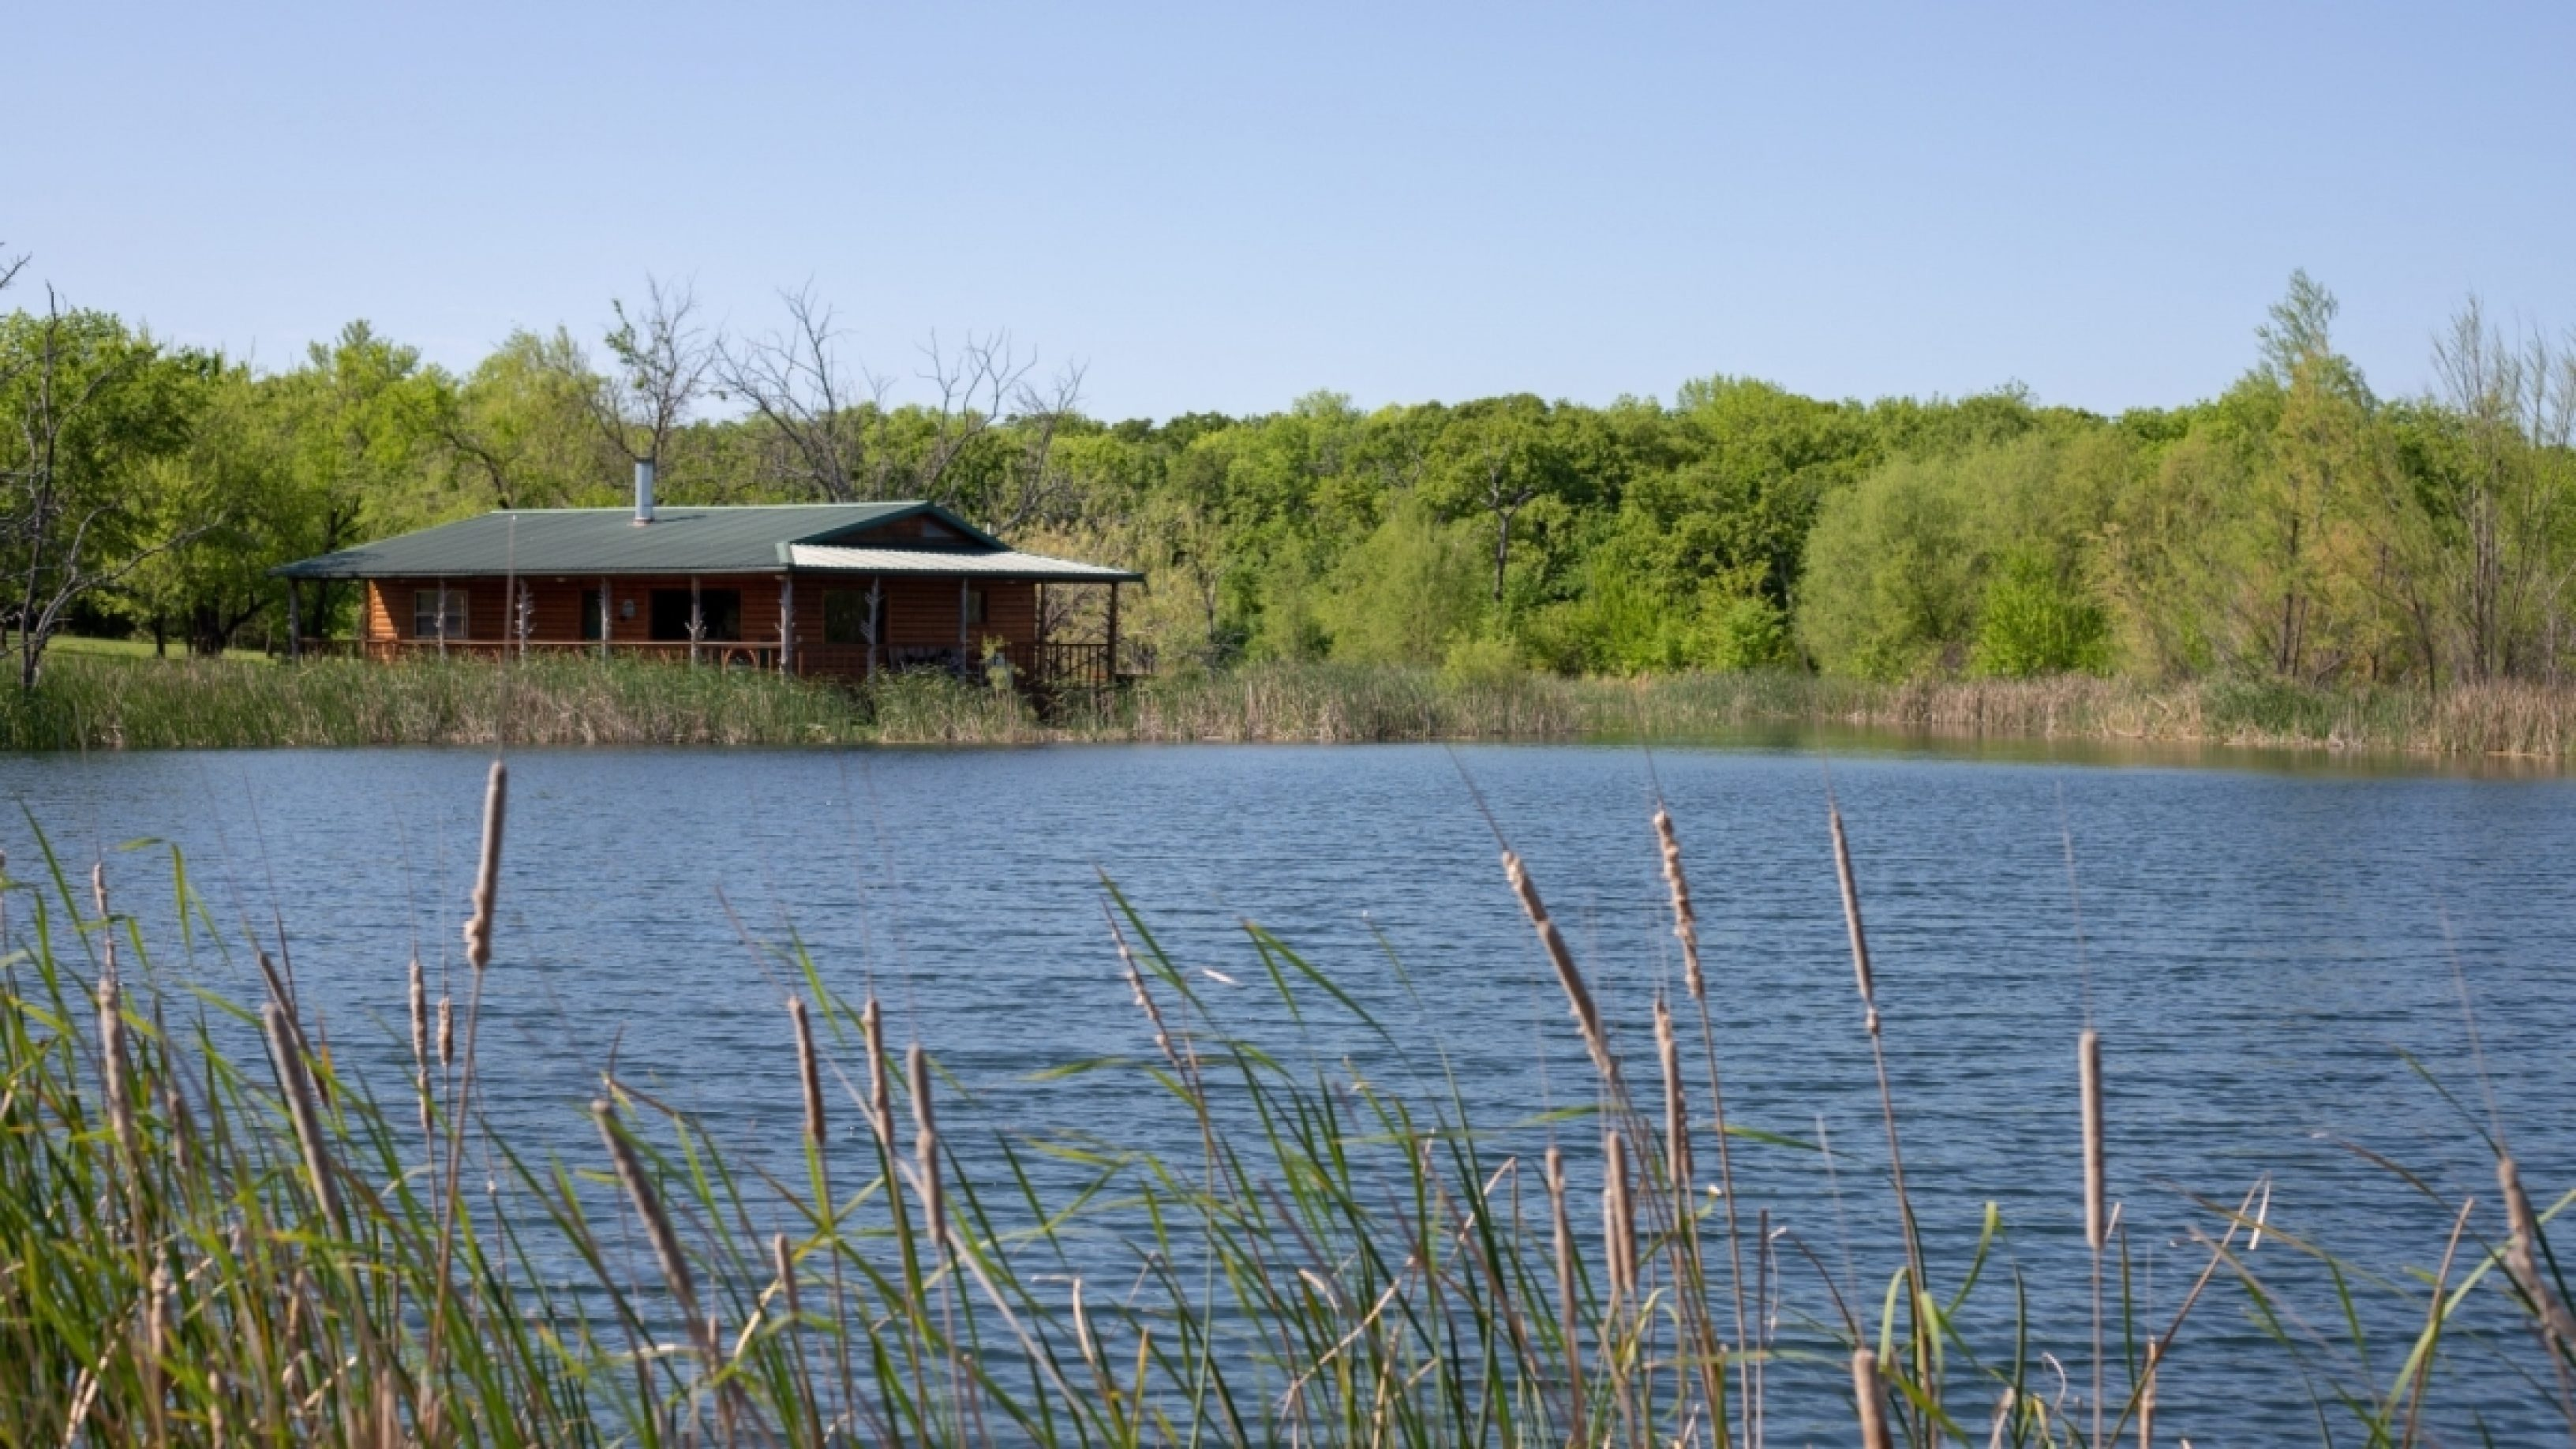 Optimized-Optimized-lake-cabin-front-view-p238z2h3et8lsyahgcm8t9aduqj5g0kuzv3vlojago (1) (1)